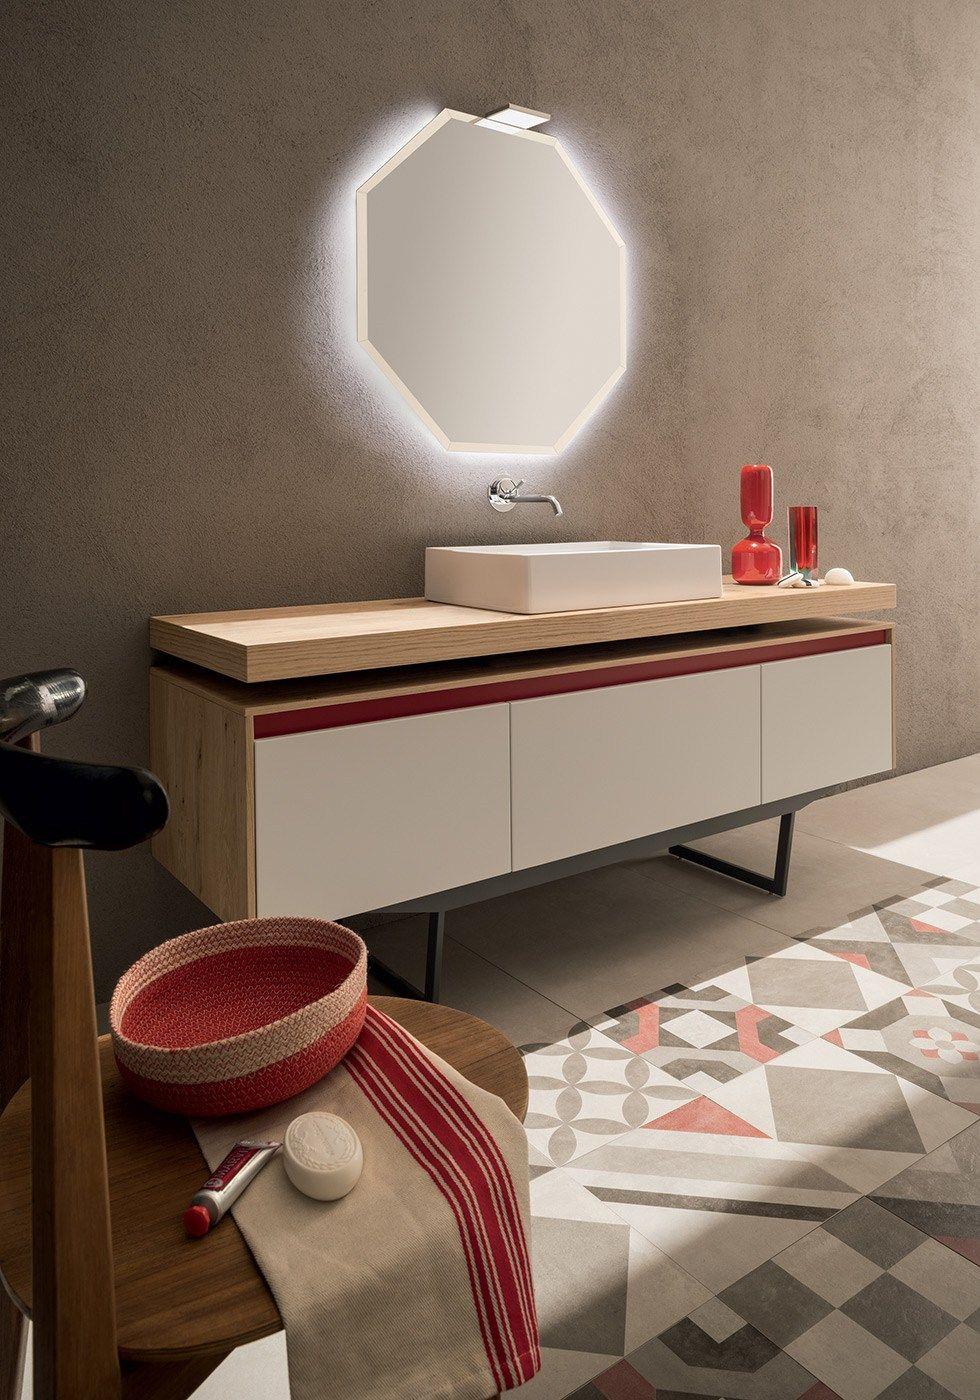 Solid wood bathroom furniture set - RAB Arredobagno | Bathroom ...